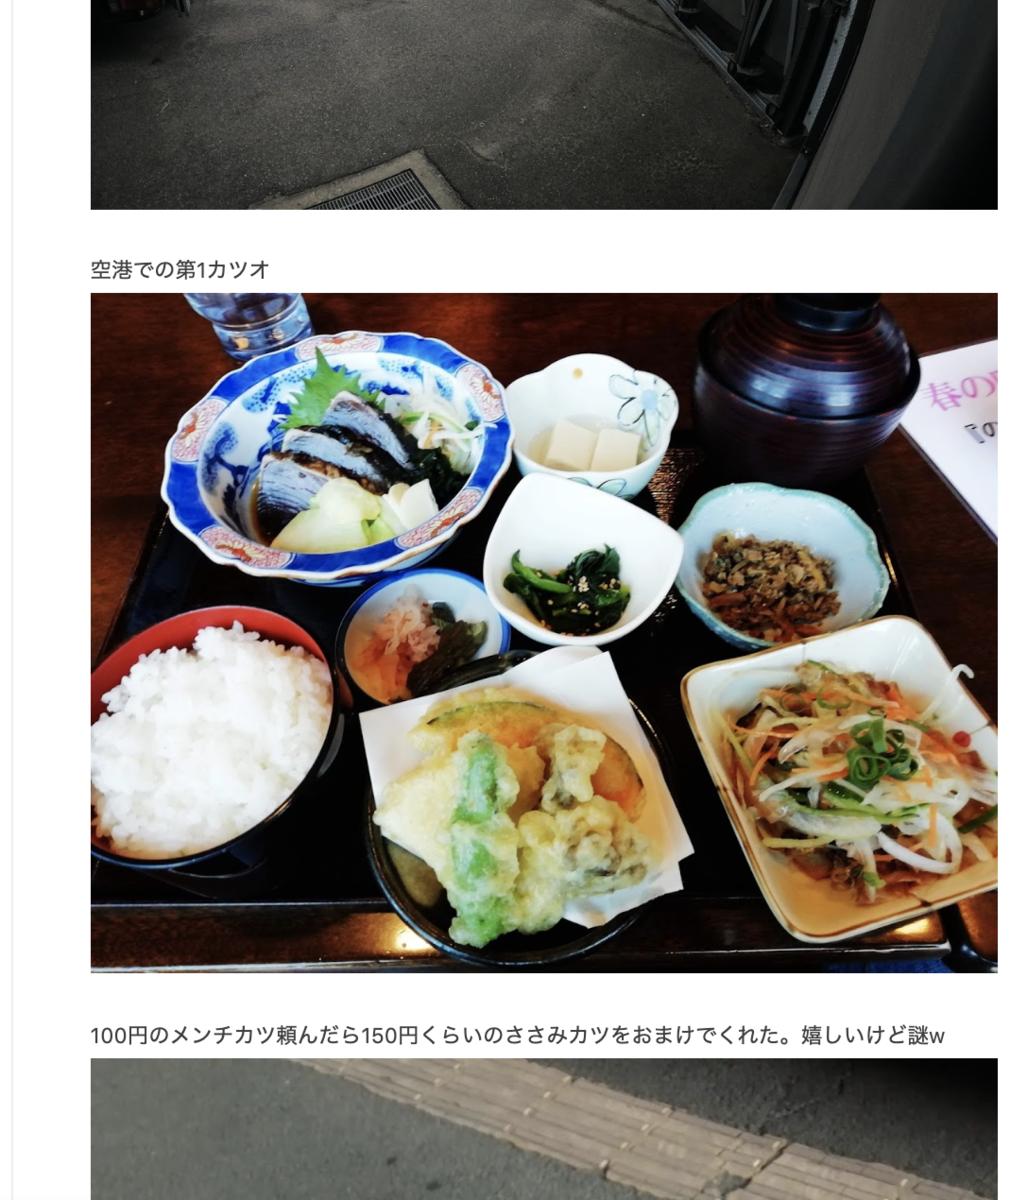 f:id:moyashidaisuke:20190909195154p:plain